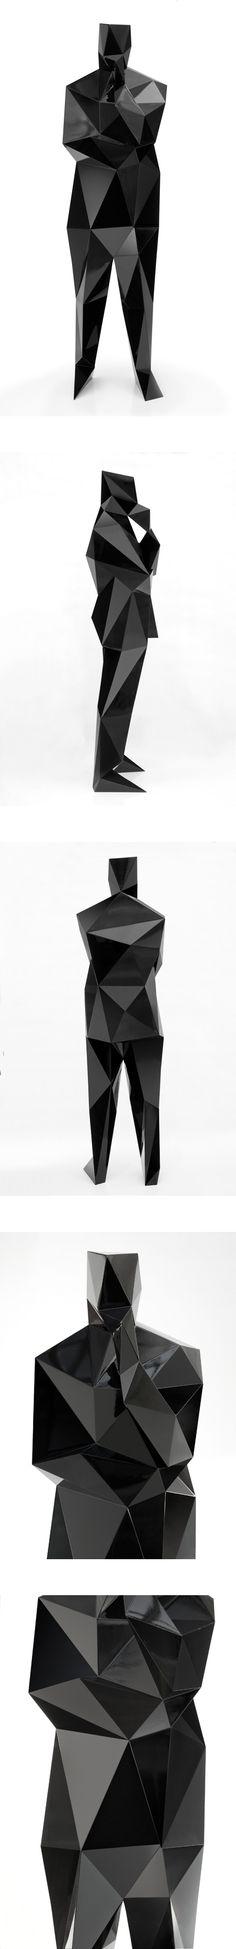 Xavier Veilhan -   Norman Foster (black)